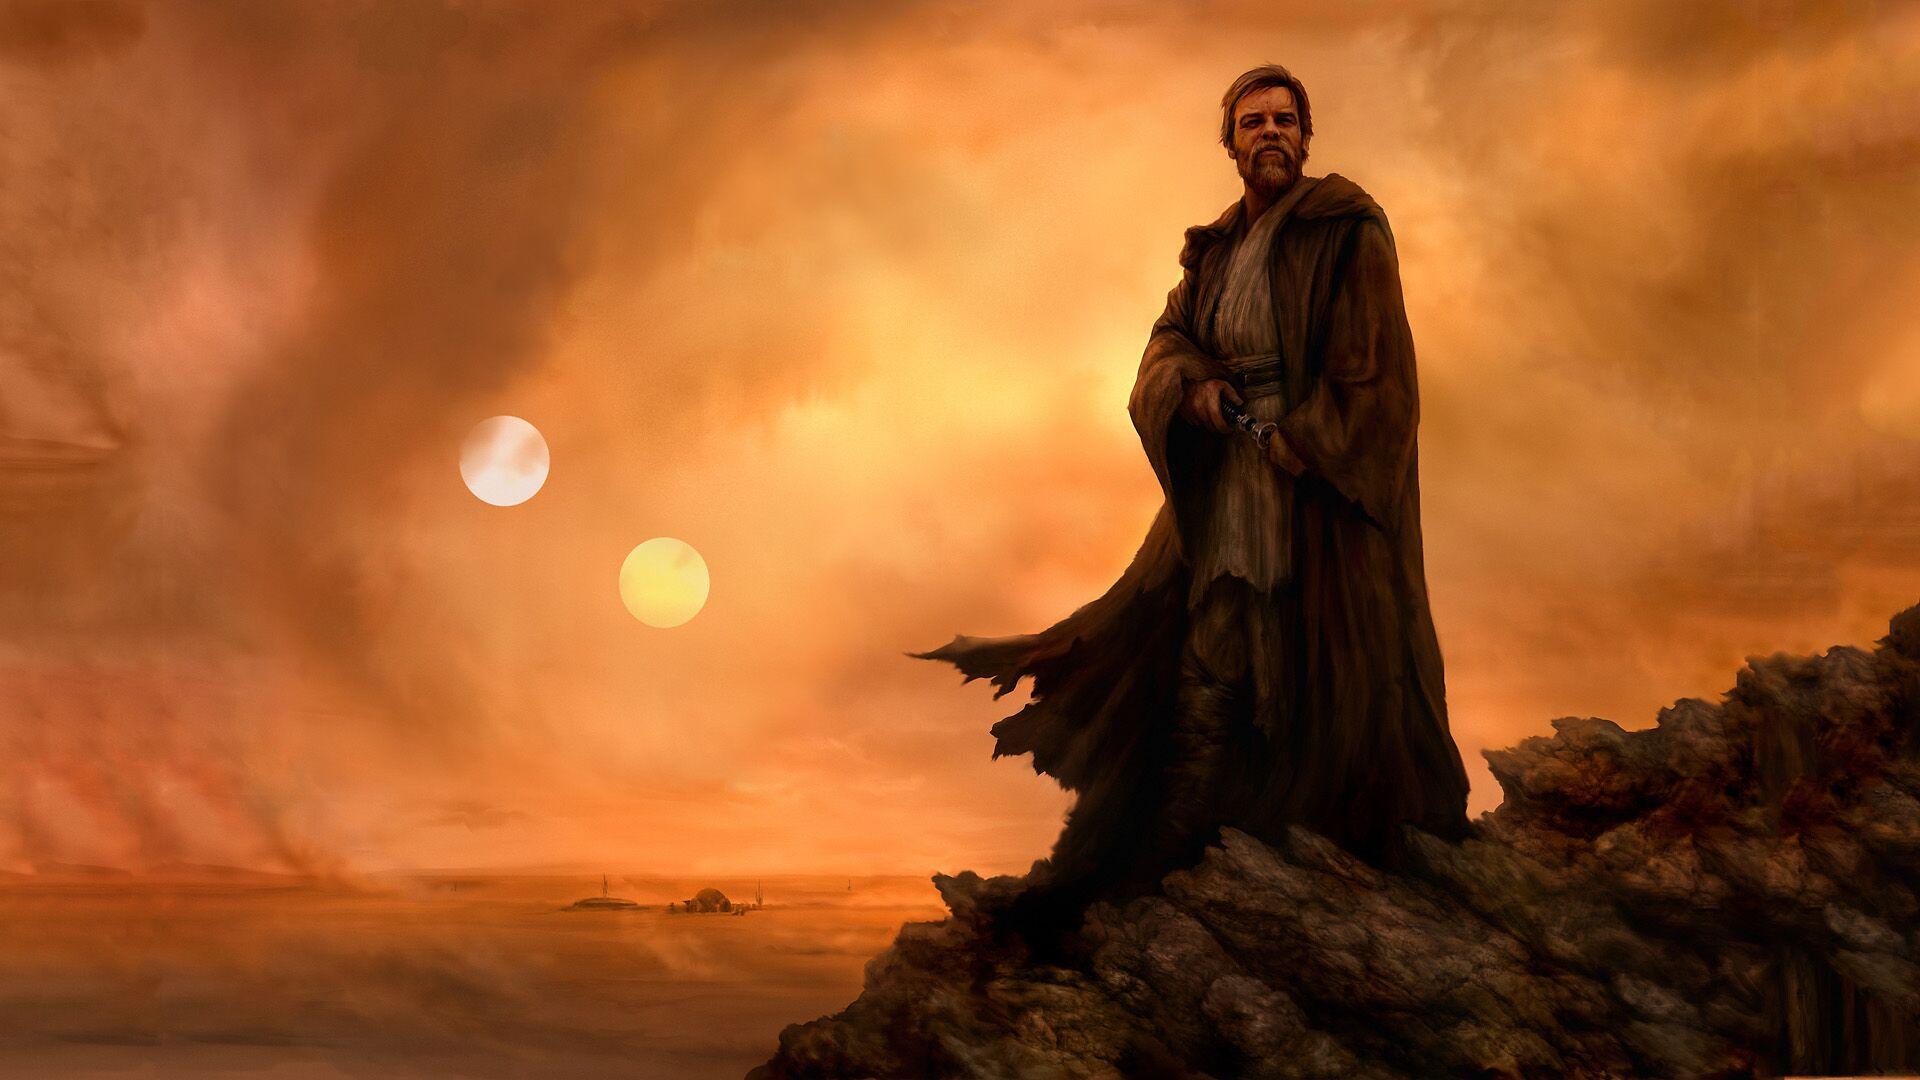 Why an Obi-Wan Kenobi Disney+ series is better than a movie